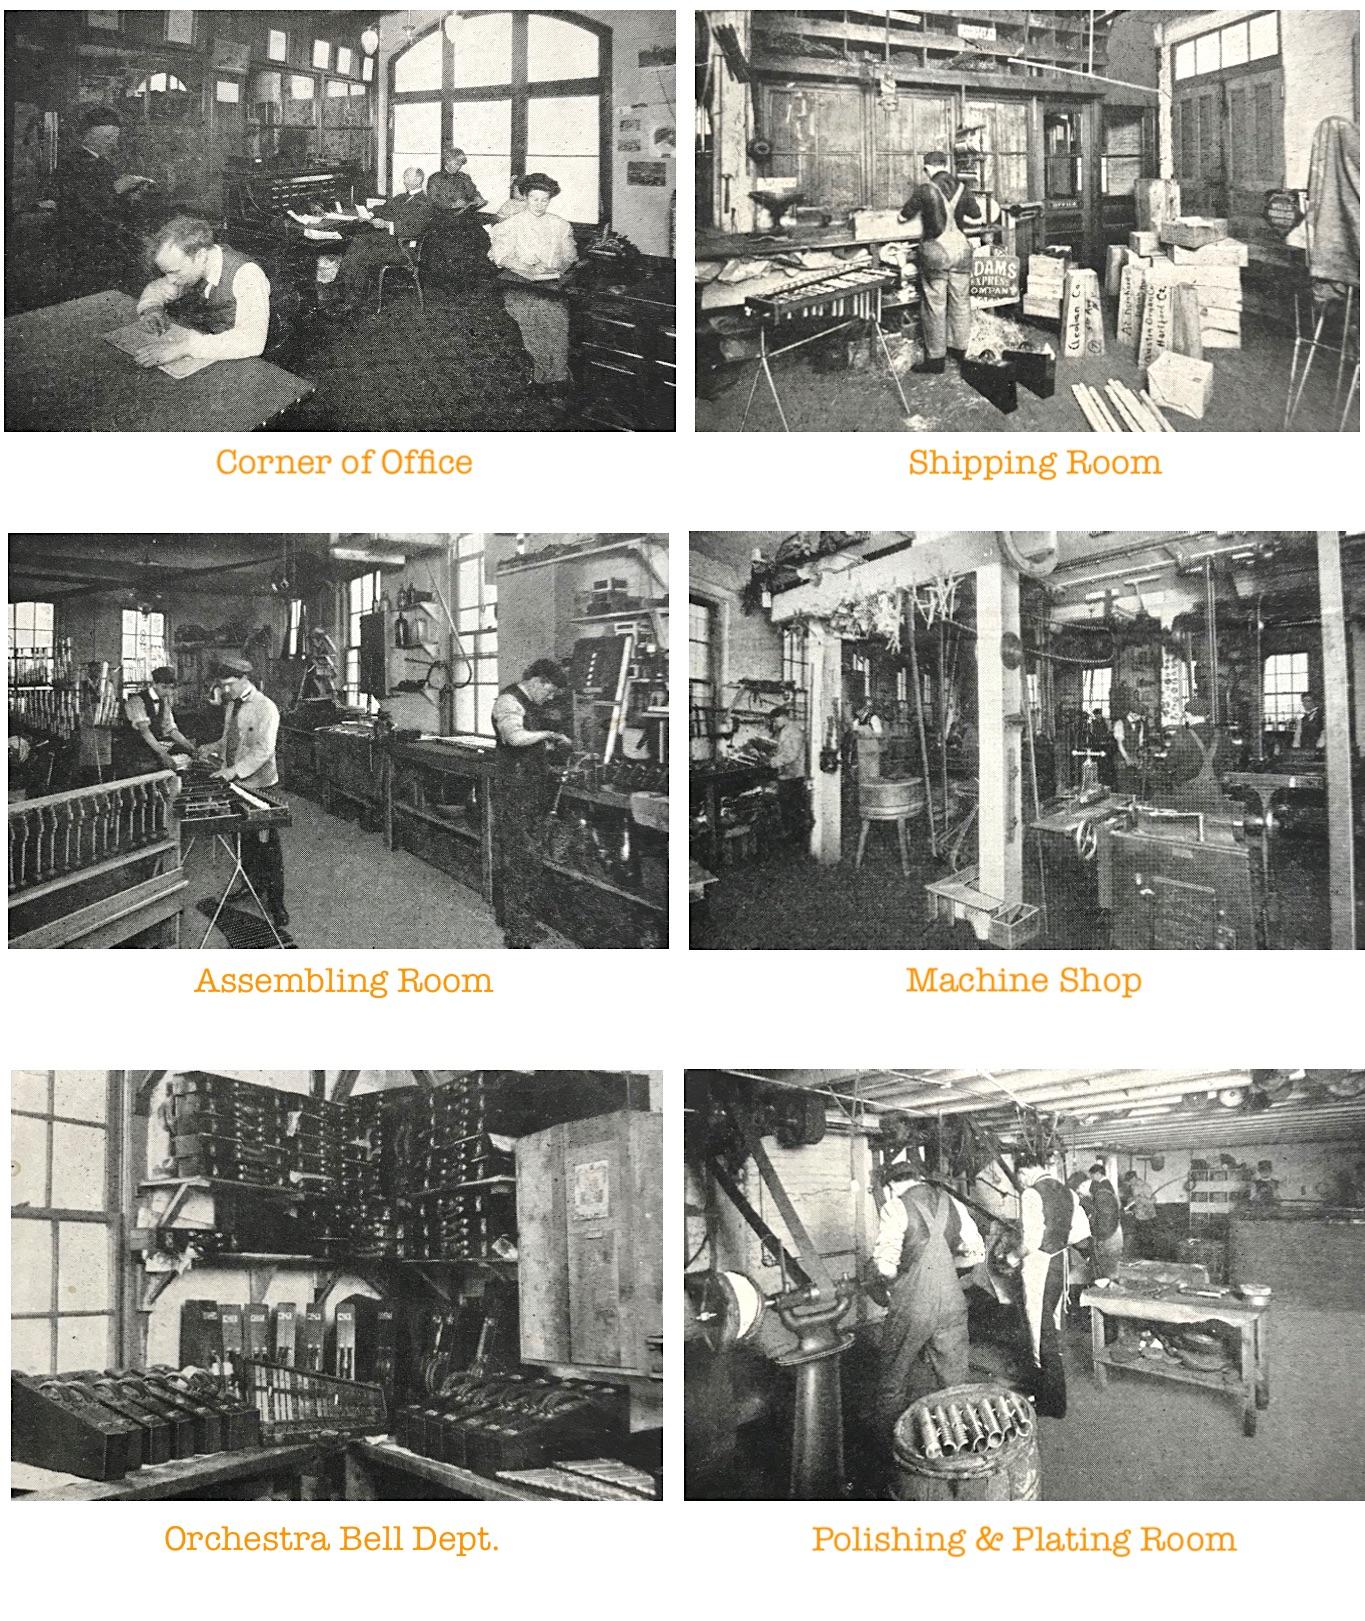 J. C. Deagan factory workers